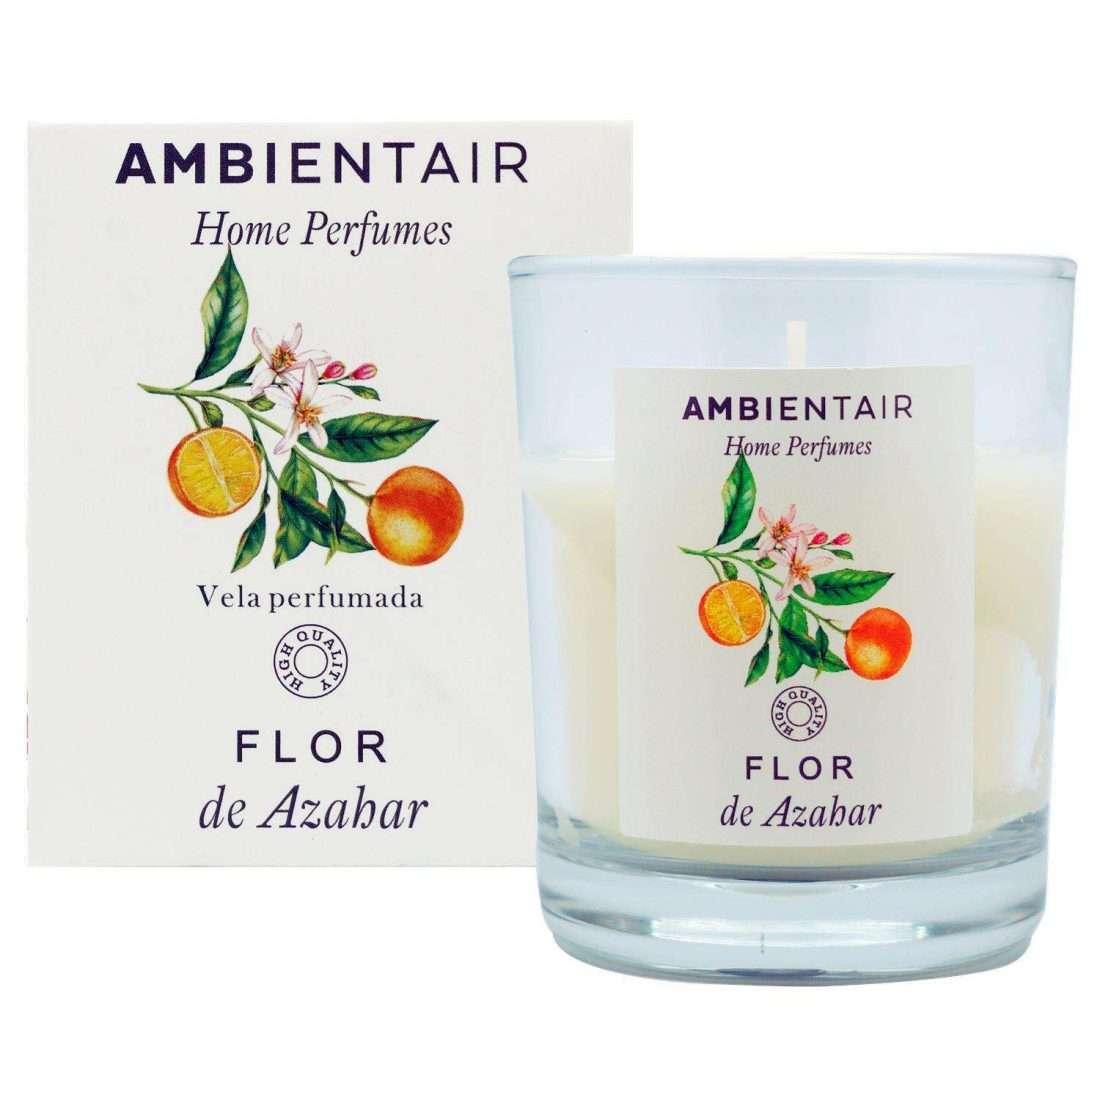 8435474423093 Vela 30 H Home Perfume Az Estuche Y Vaso 2